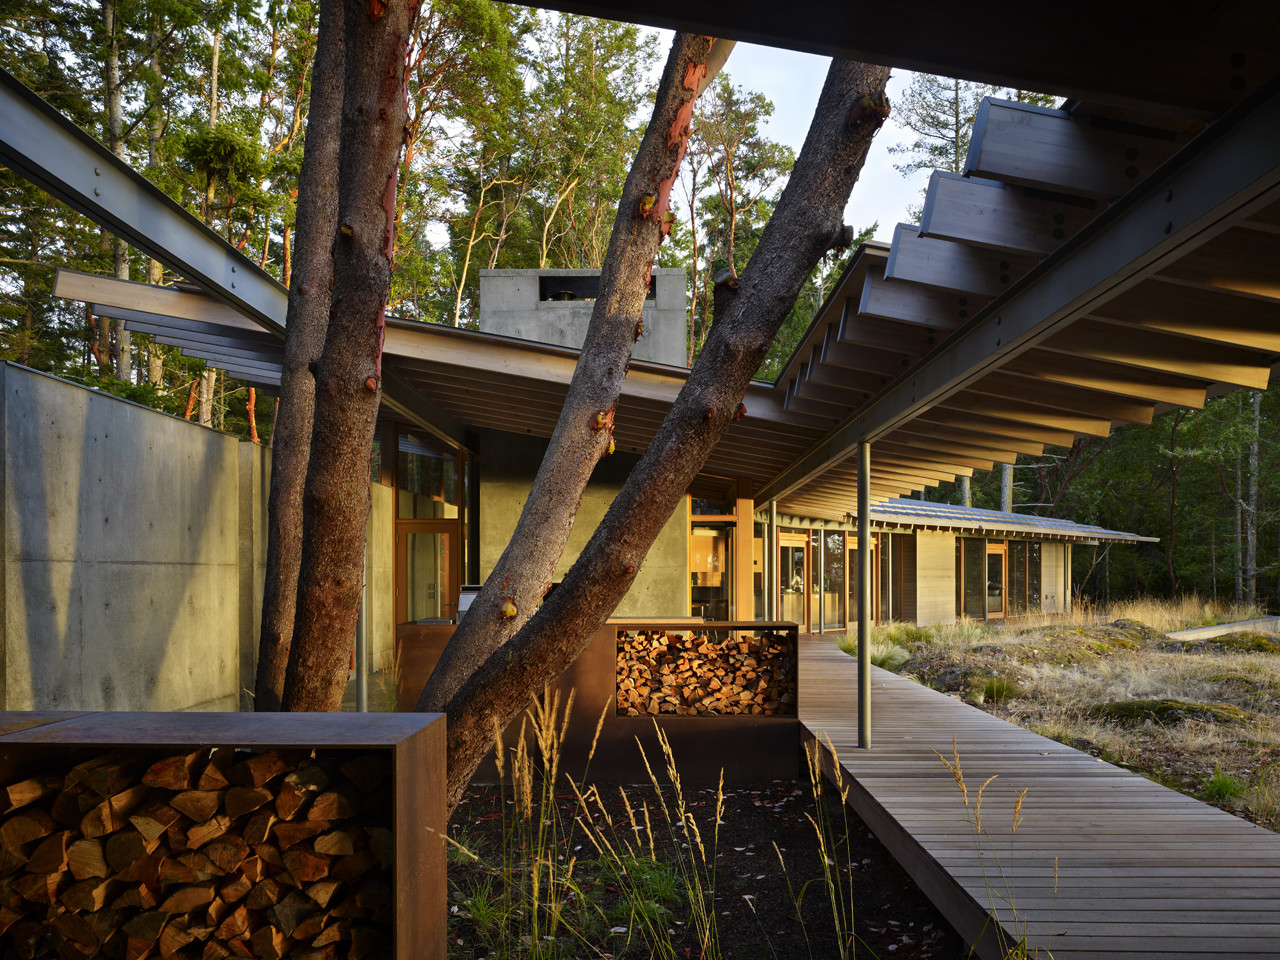 Suncrest Residence / Heliotrope Architects, © Benjamin Benschnieder